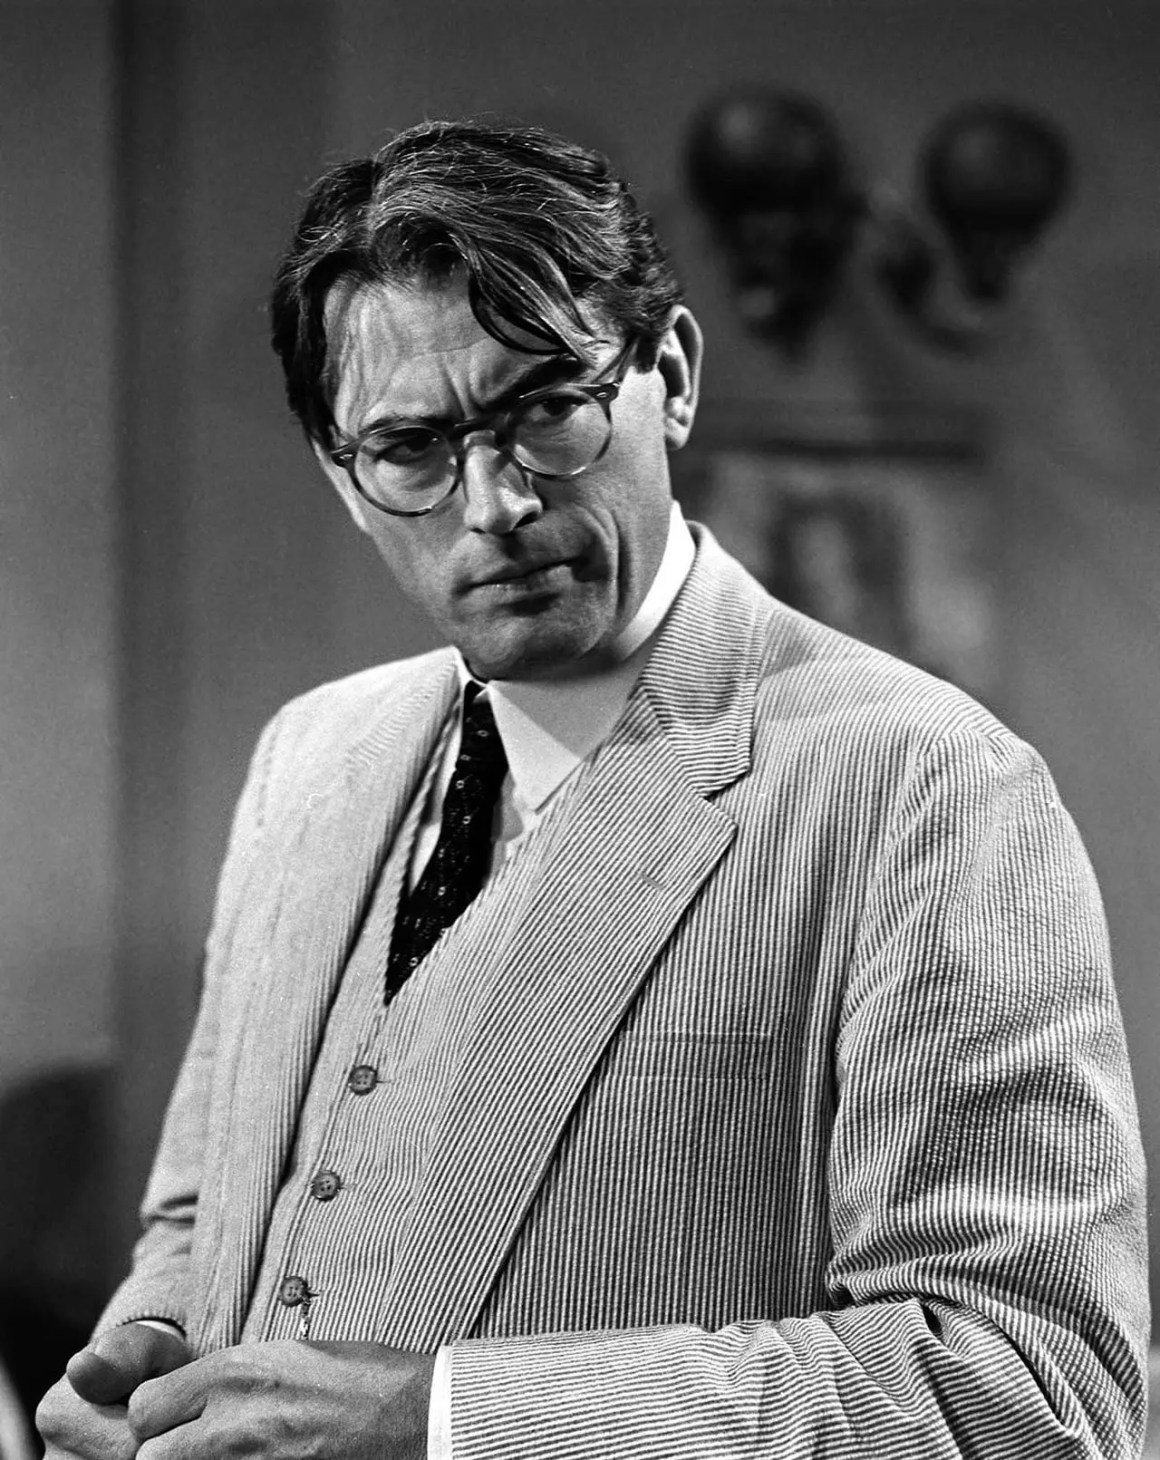 Seersucker - Atticus Finch